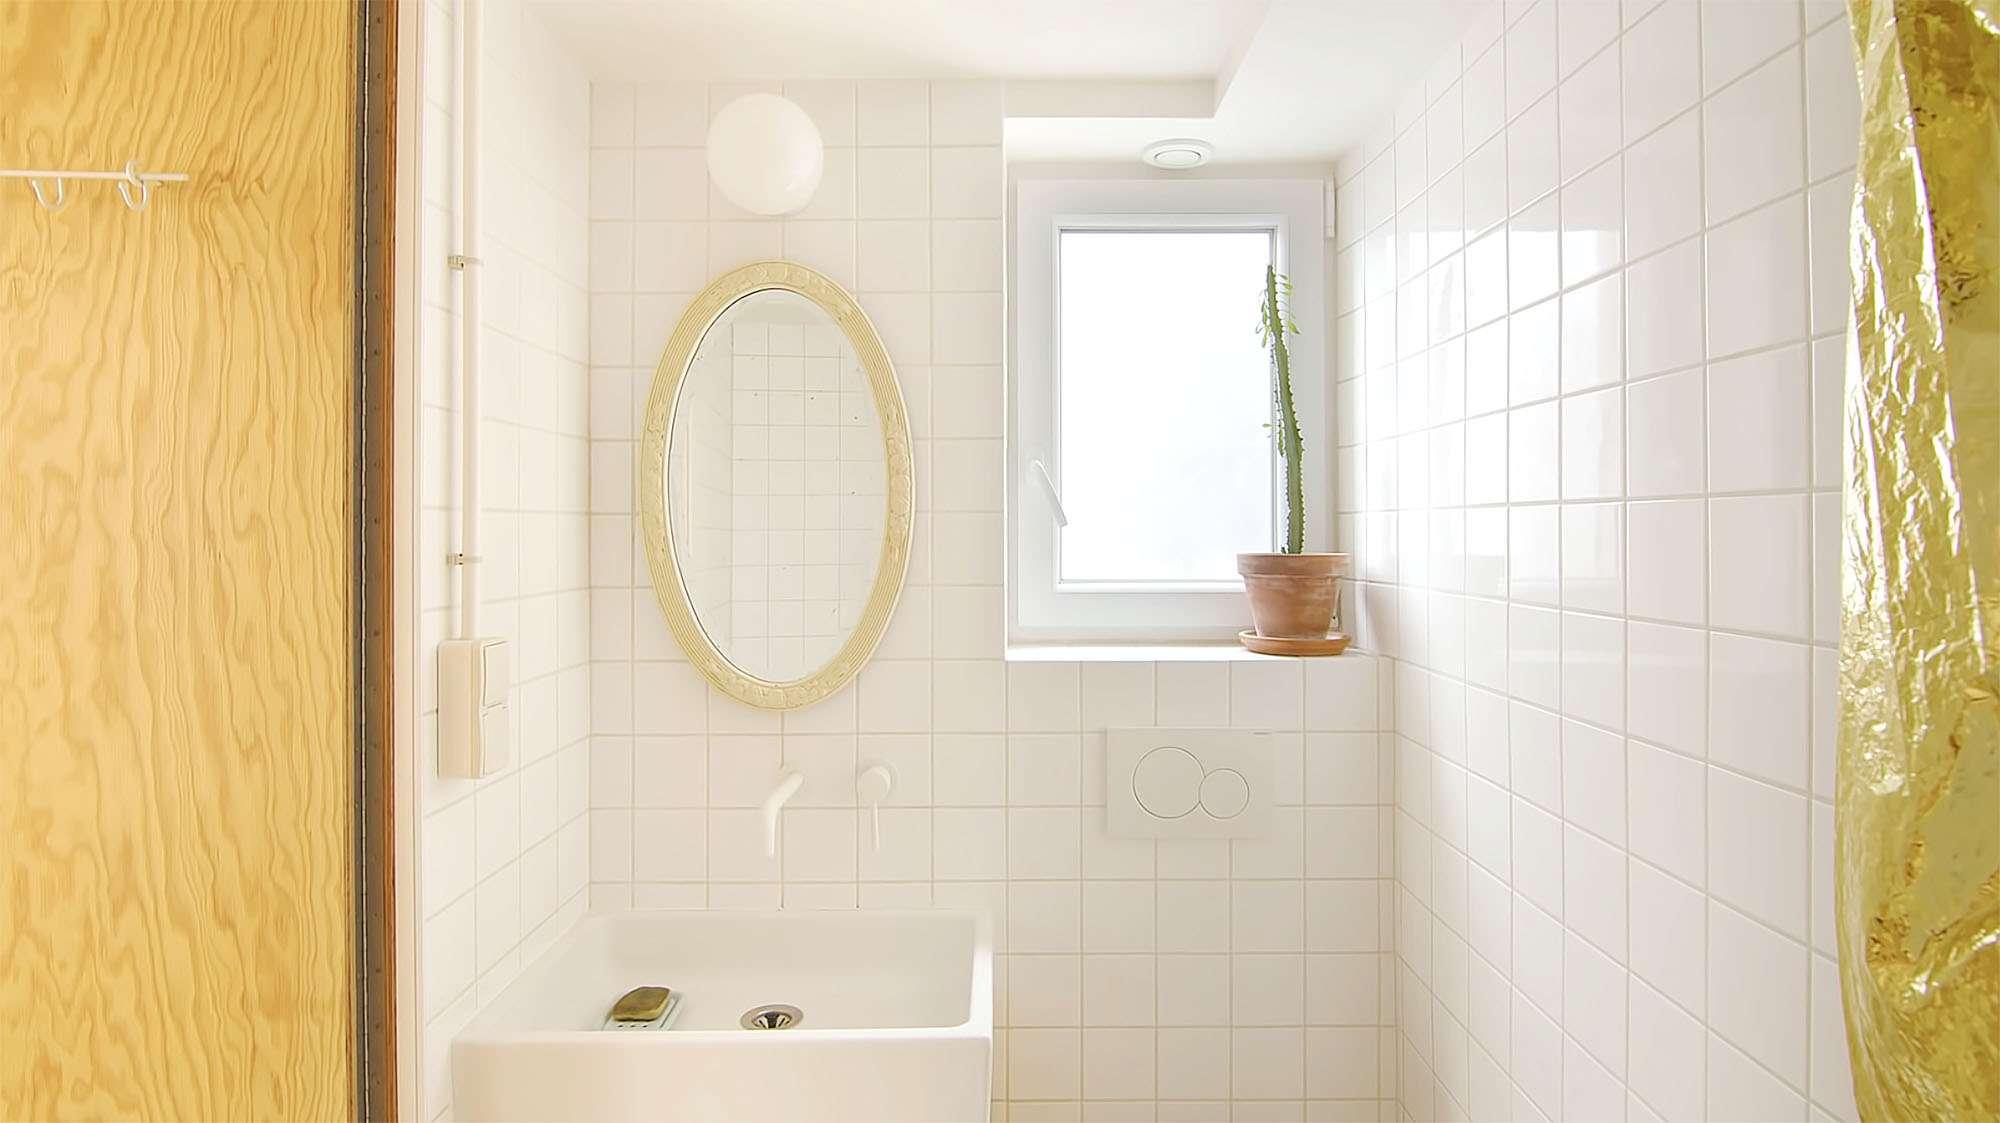 Jourdain micro-apartment renovation Matthieu Torres bathroom